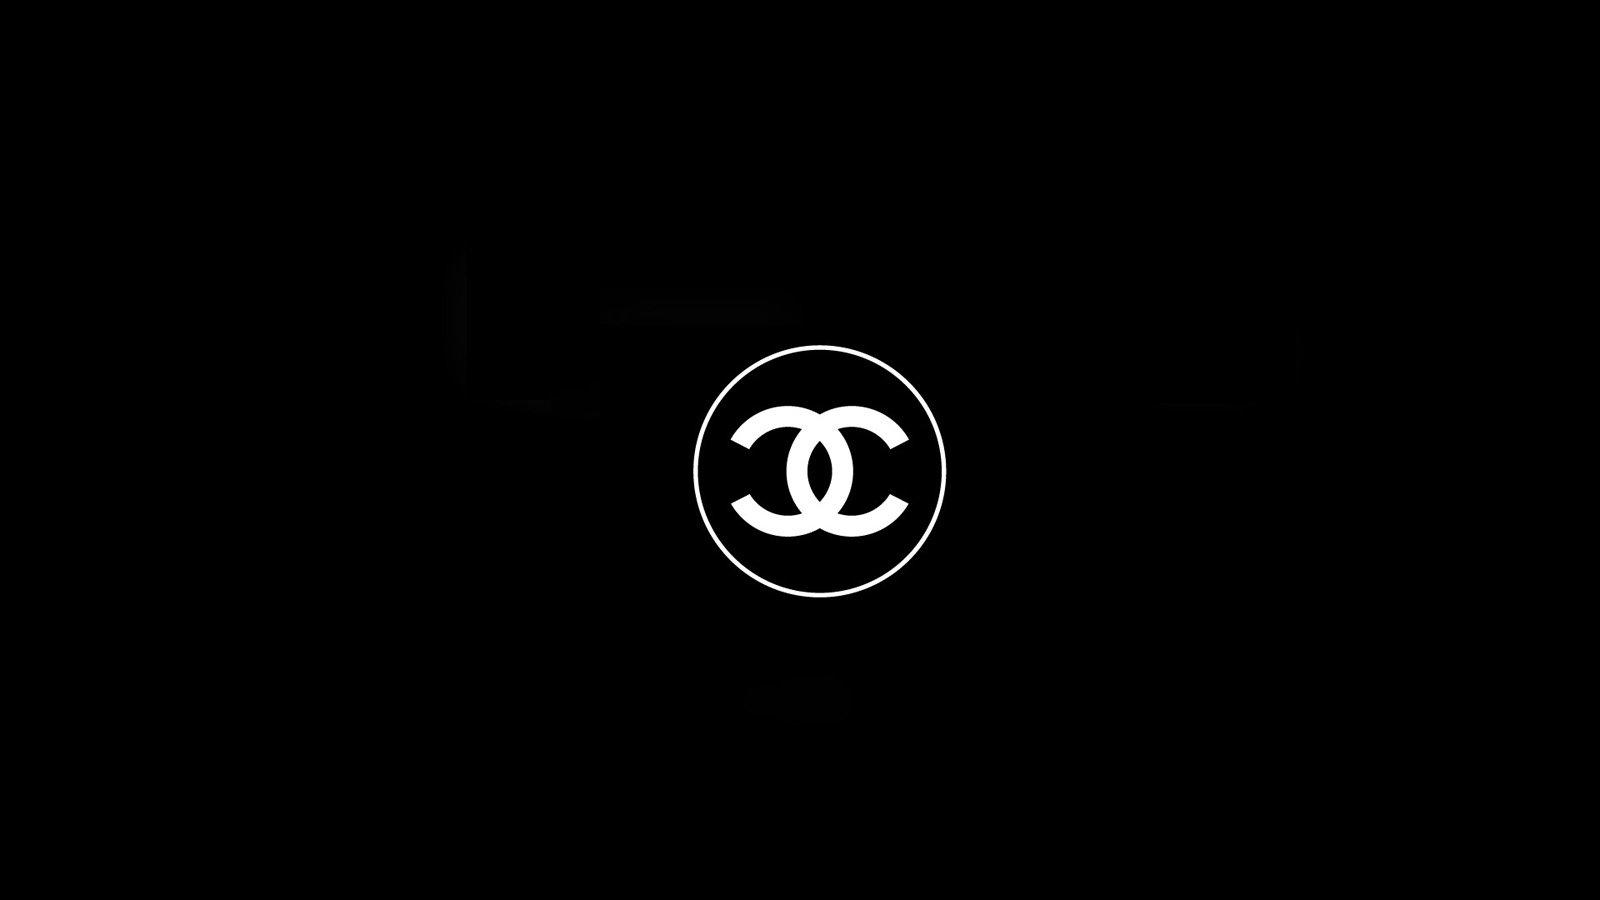 Chanel Wallpapers HD - WallpaperSafari